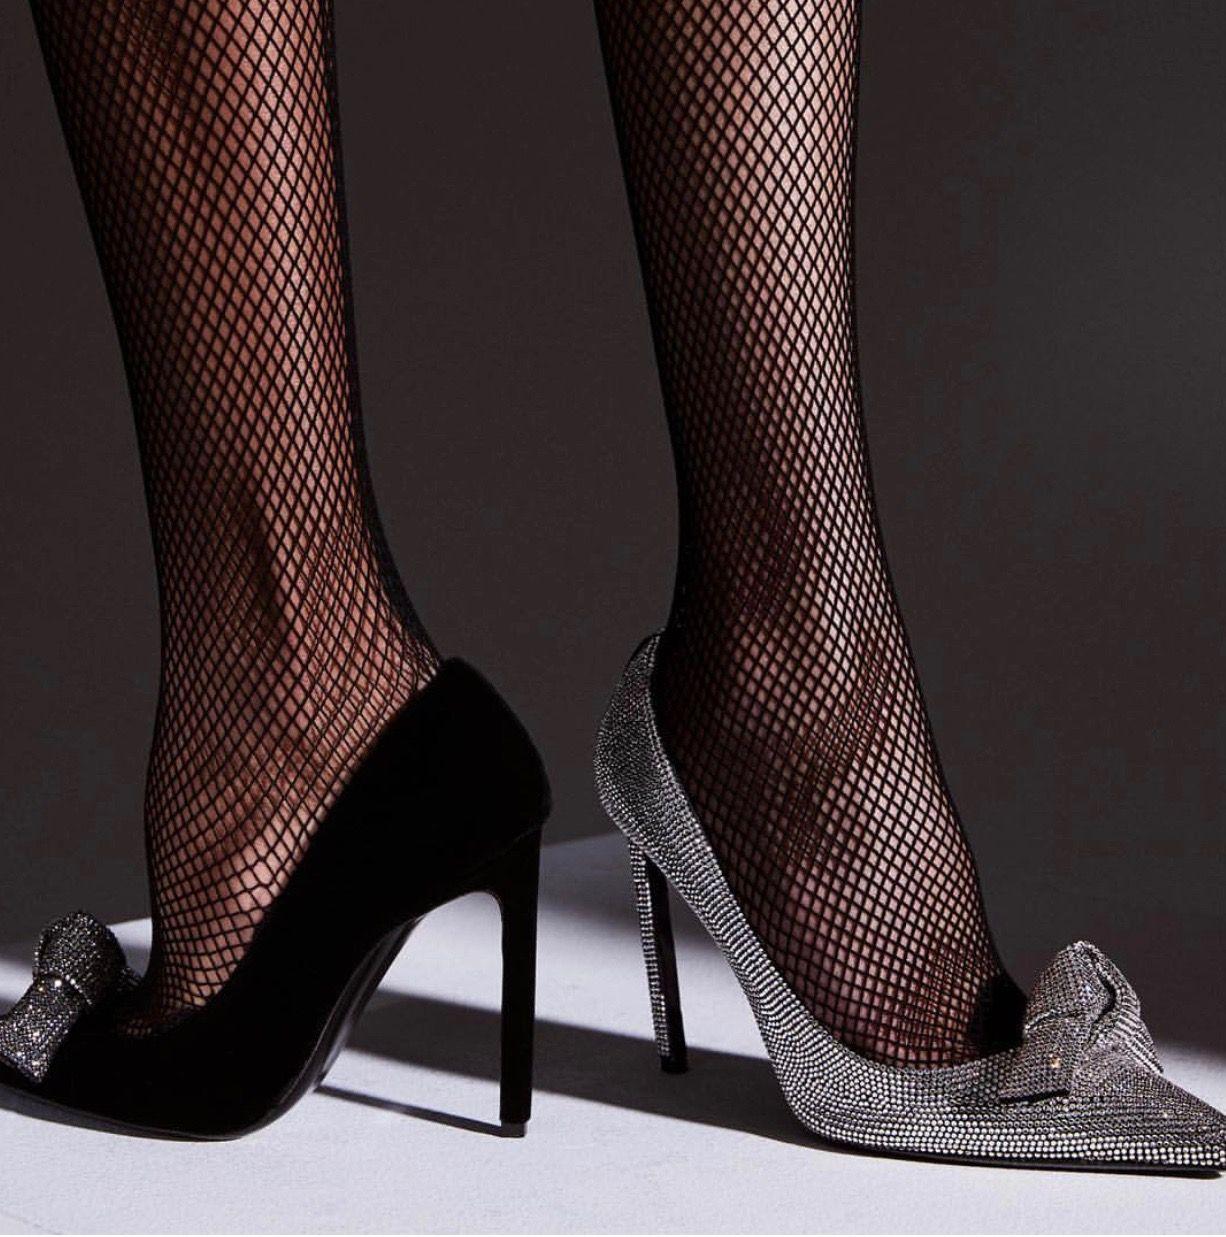 edb0ed04b981 Tom Ford Stilettos 2019  shoes  shoesaddict  sandals  zapatos  estilo   fashion  style  vanessacrestto  stiletto